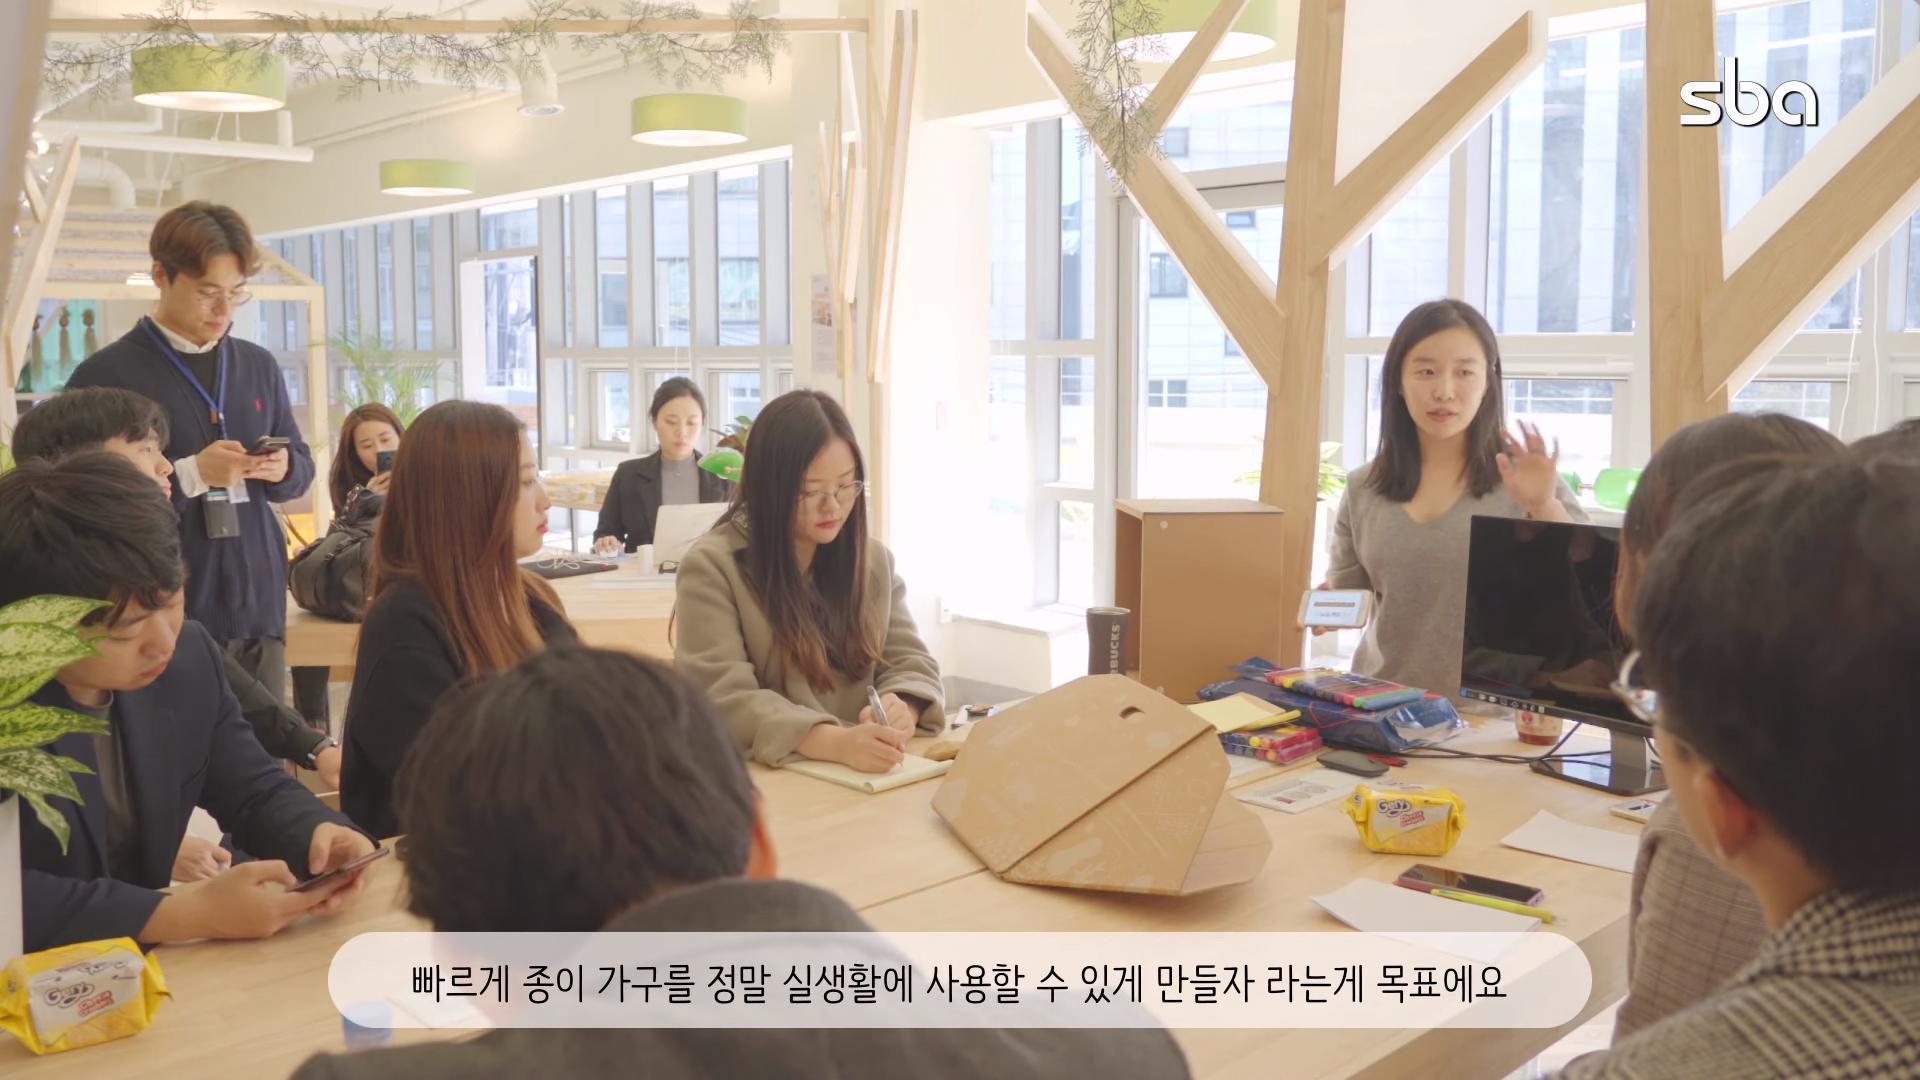 2019.11 Youtube_좋은 직장구직러모여라! 직구